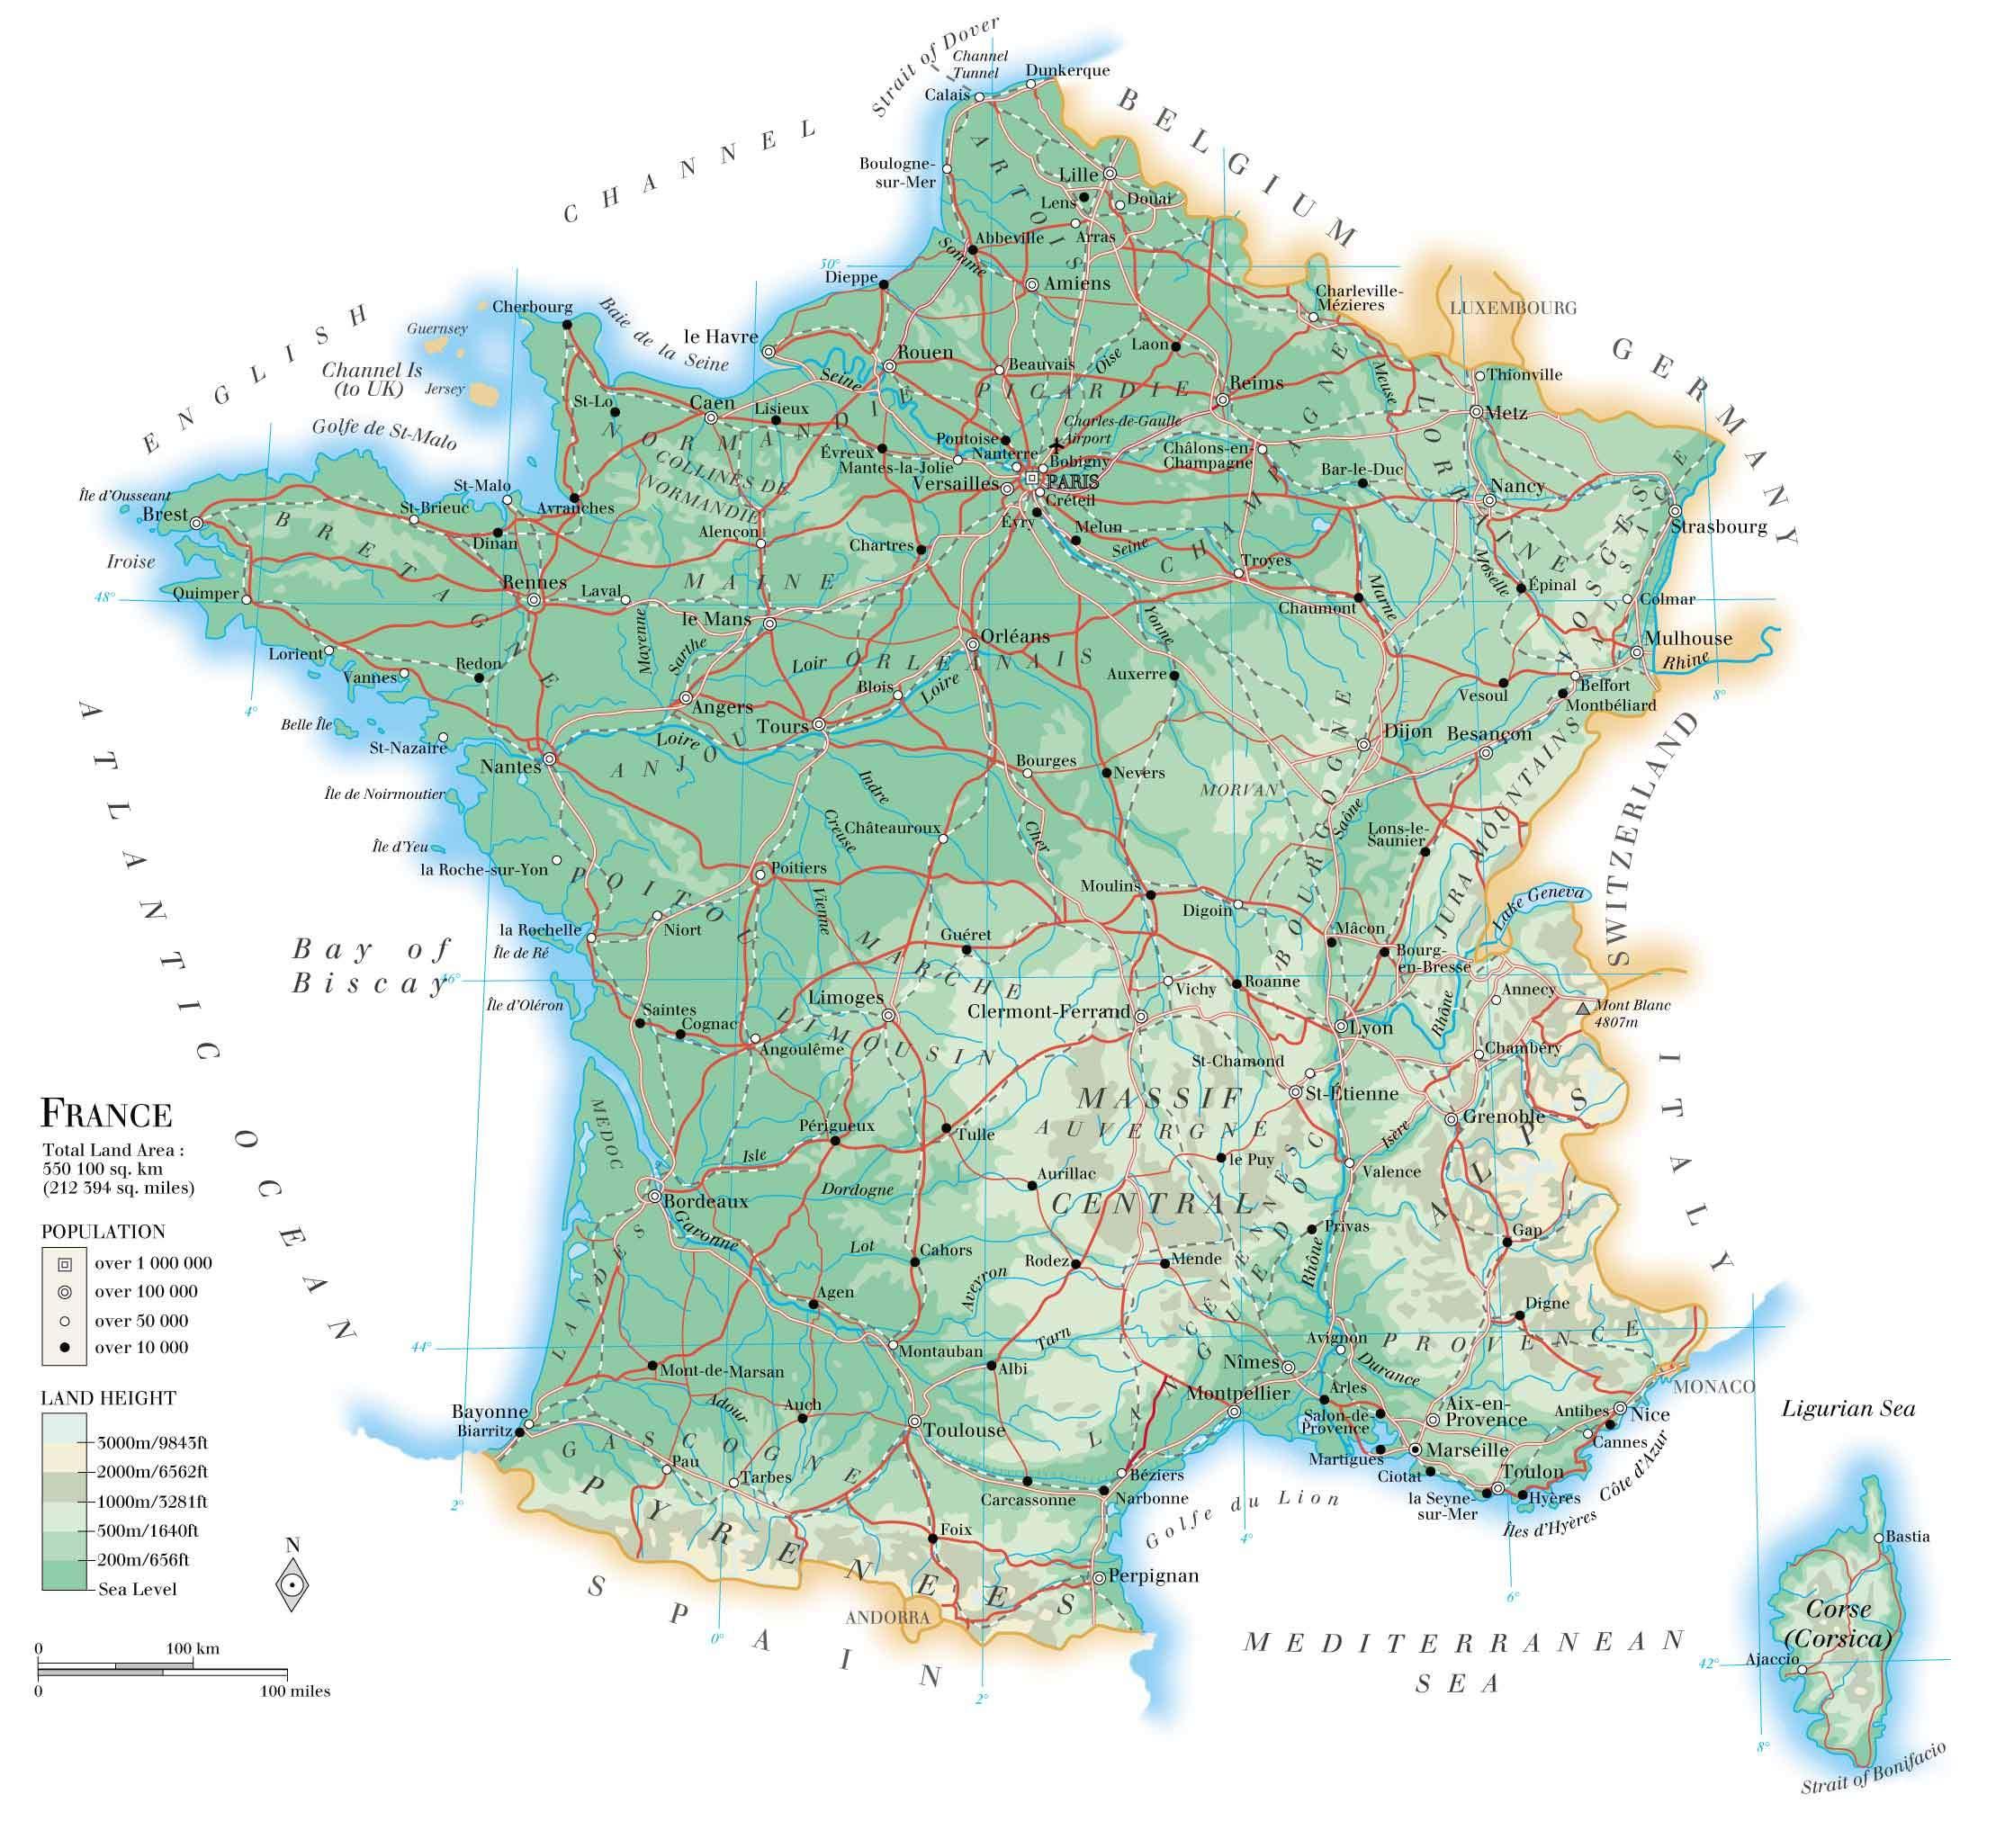 Grande Carte De France A Imprimer | My Blog serapportantà Imprimer Une Carte De France